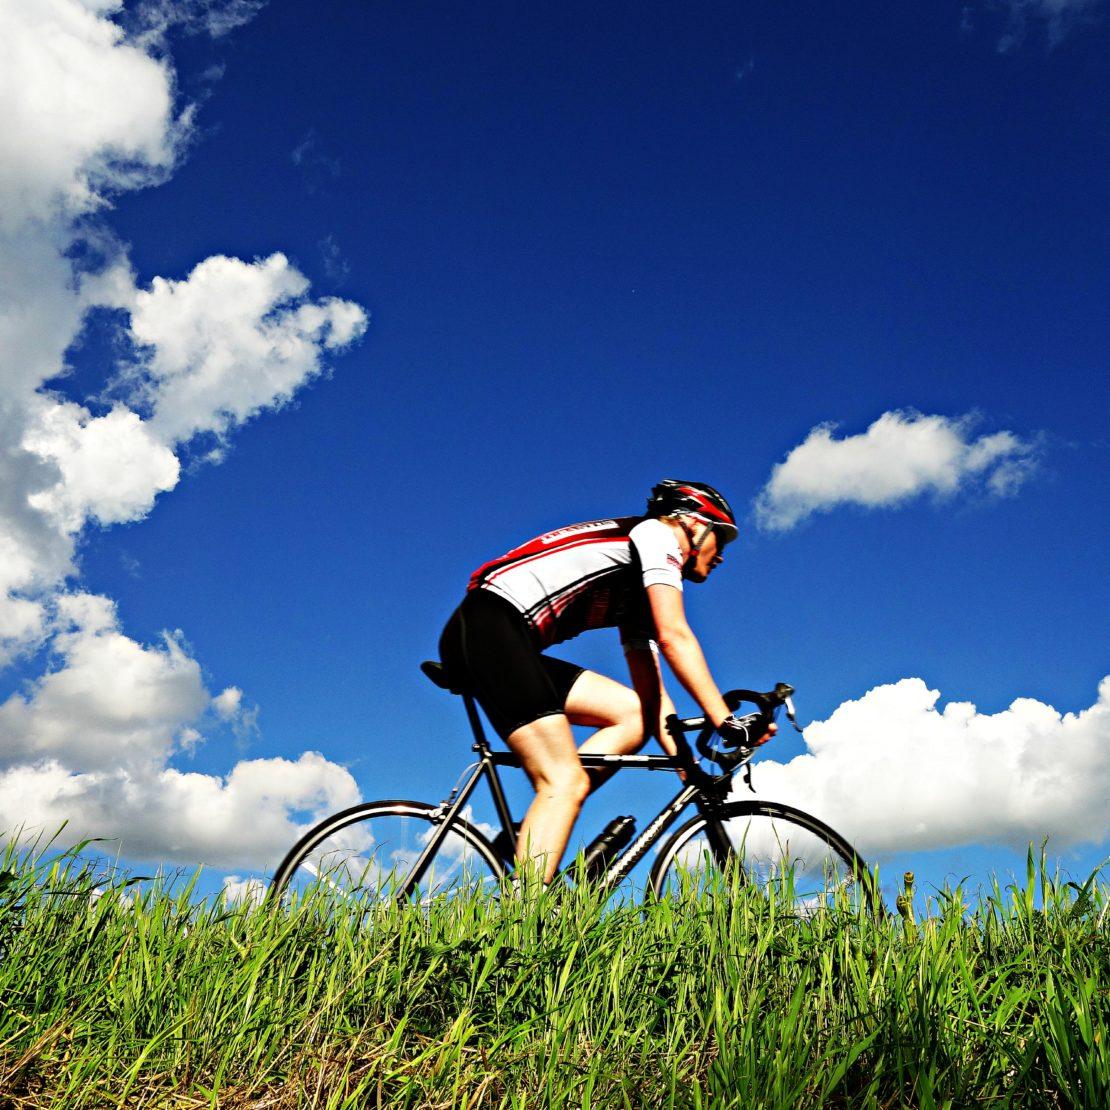 bicycle-bicyclist-bike-128202